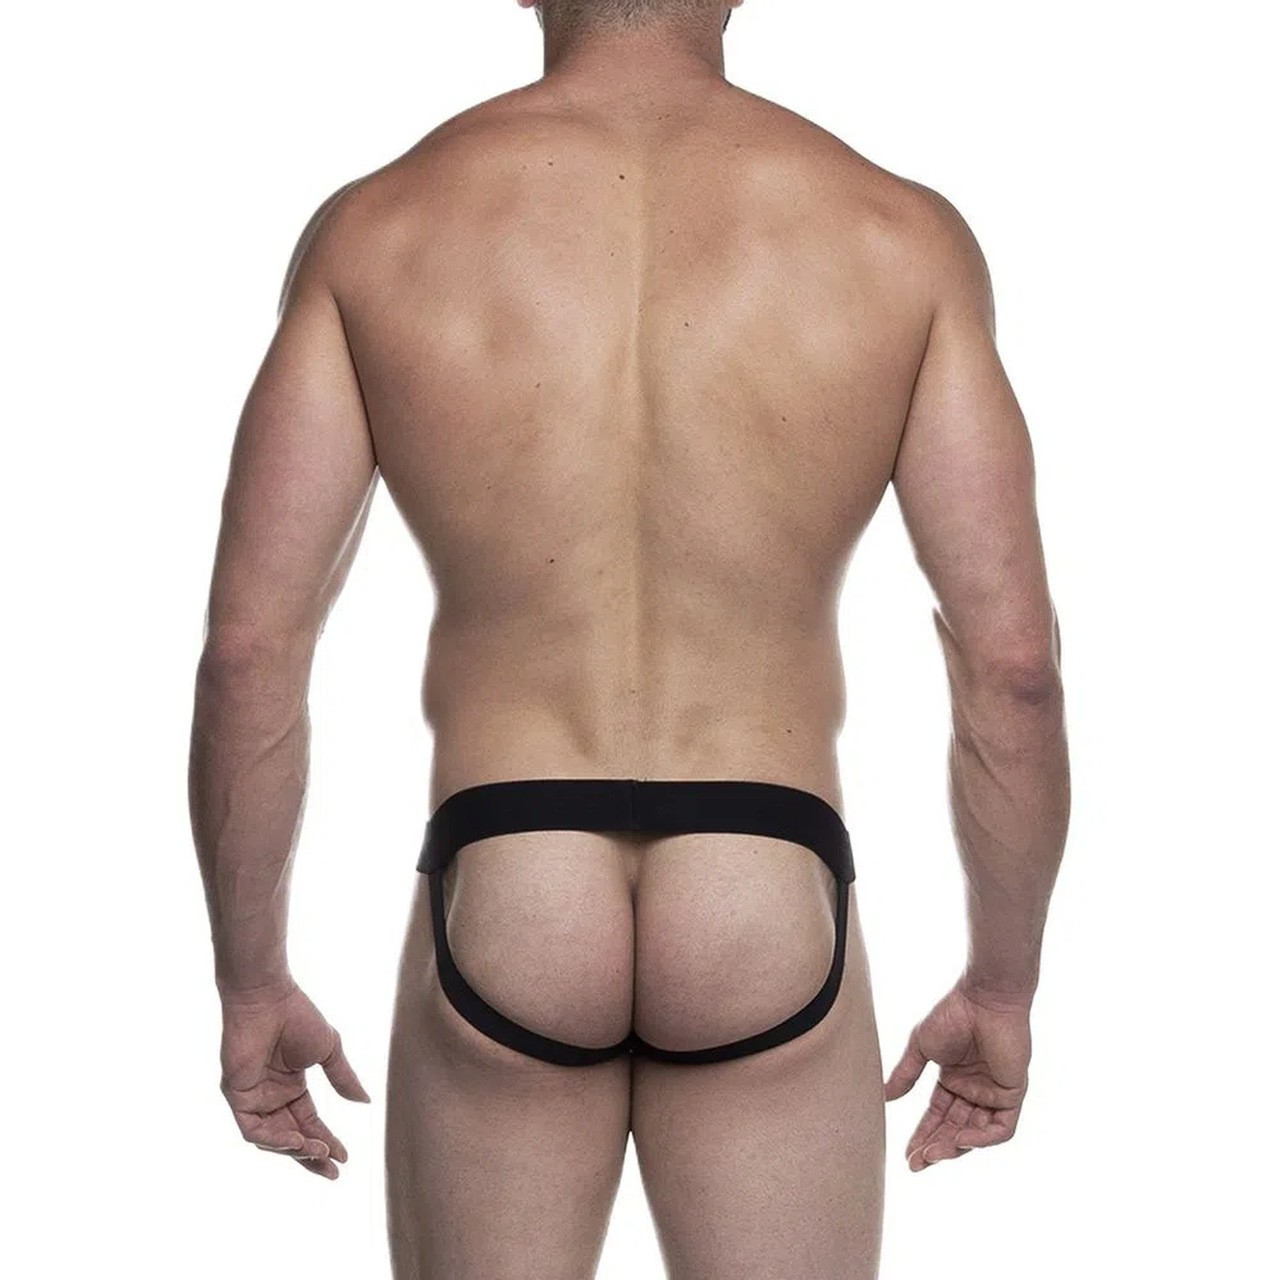 Cueca JockStrap Abertura Frontal - SD Clothing